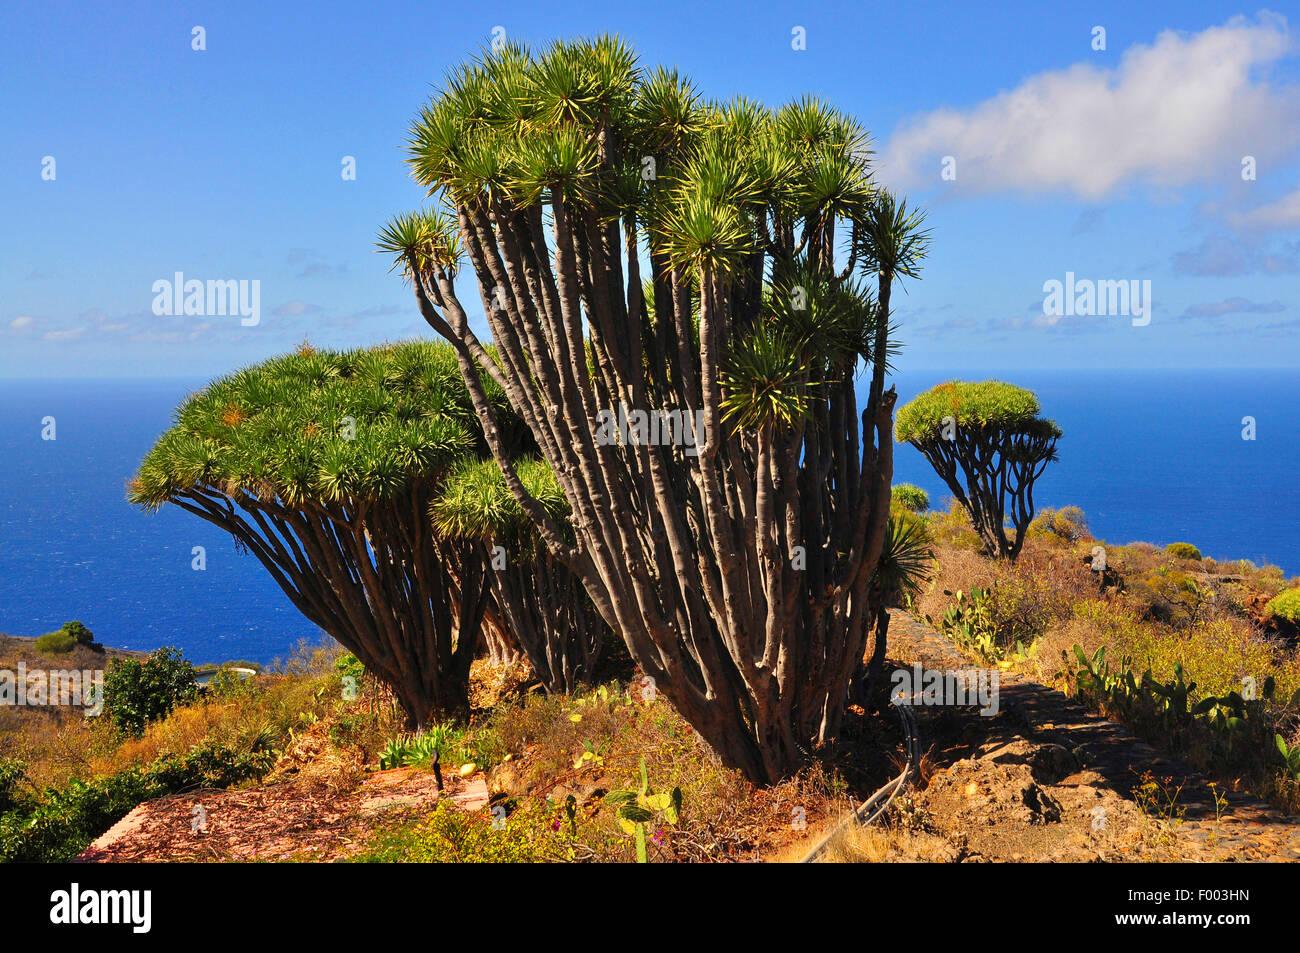 Tear Dragon's blood, Draegon Tree, Canary Islands Dragon Tree, Drago  (Dracaena draco), Draegon trees in front - Stock Image